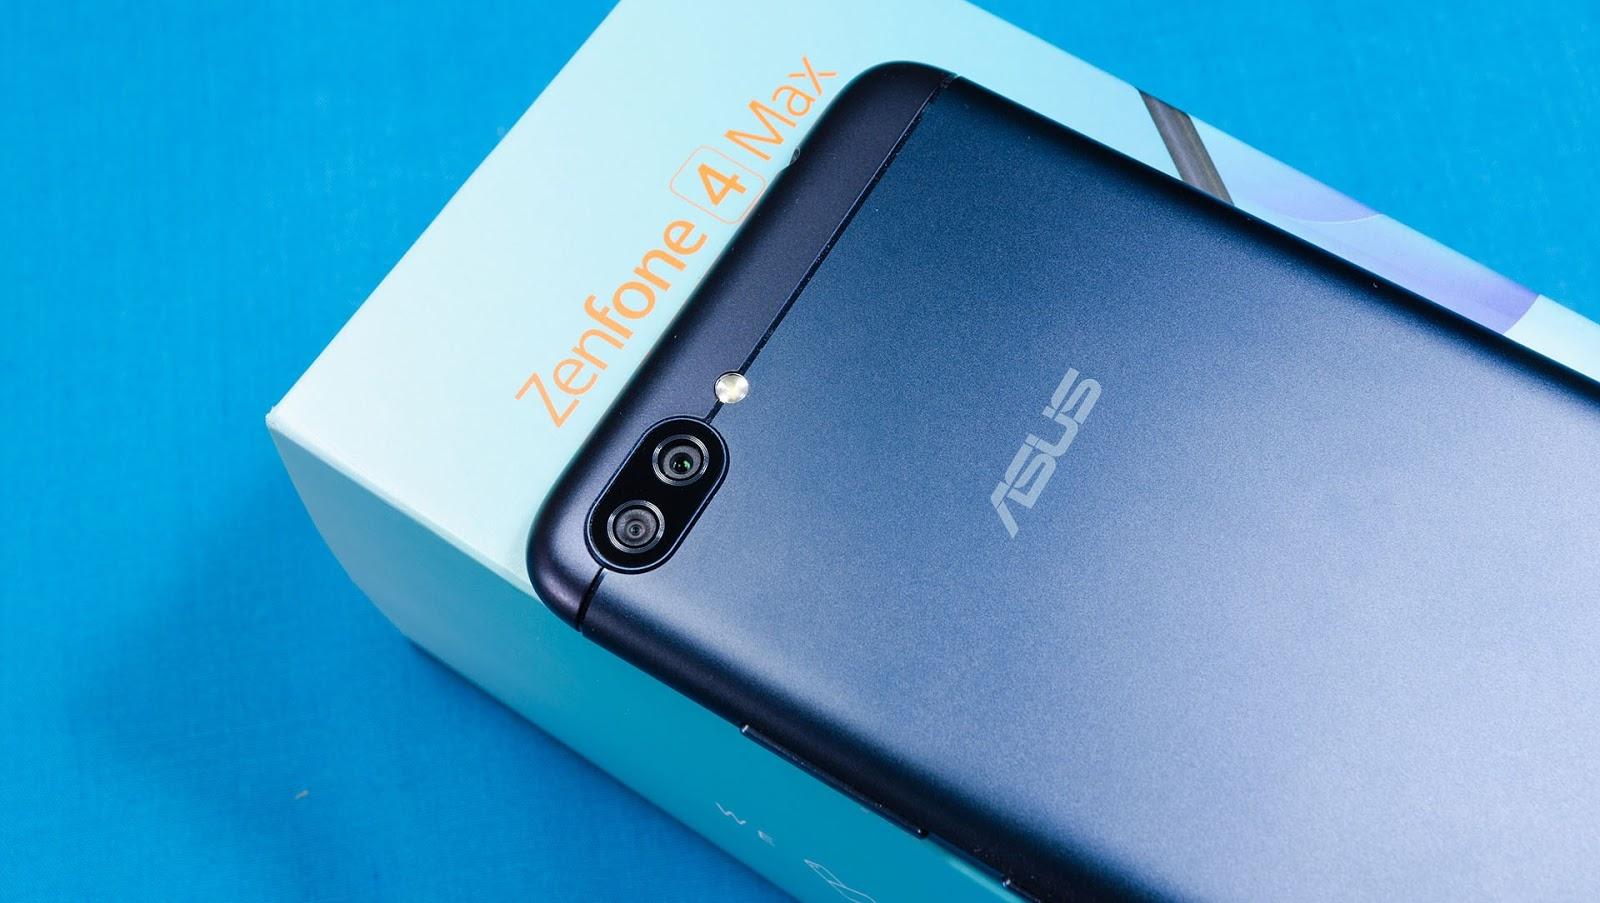 Tem smartphone asus confira 4 dicas simples para economizar bateria asus zenfone 4 max pro header 2 stopboris Image collections